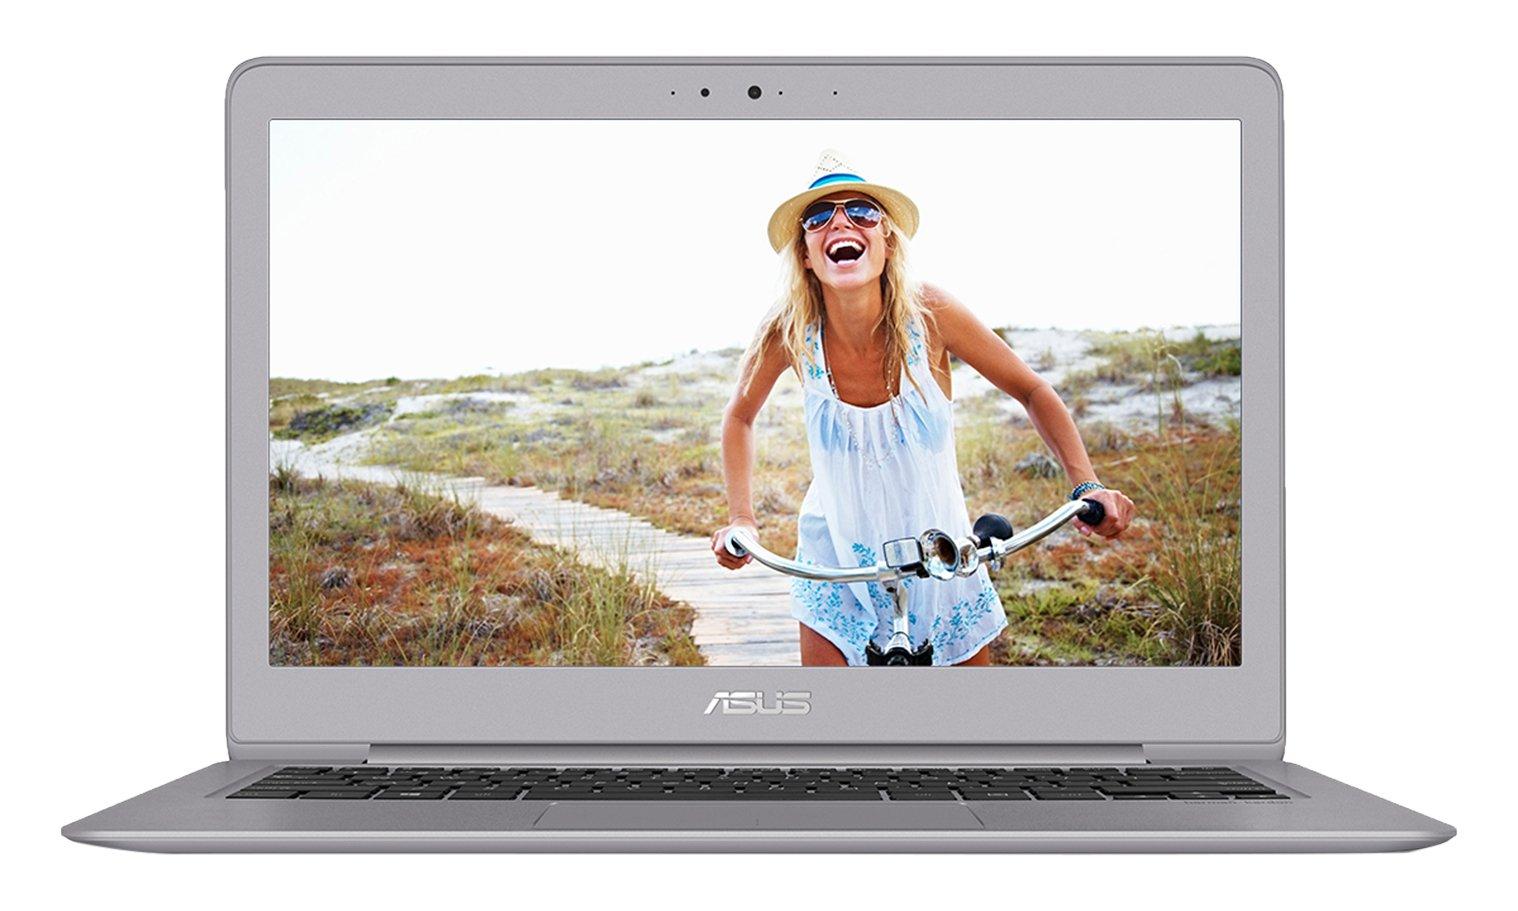 [2017 Version] ASUS ZenBook UX330UA-AH5Q 13.3-inch QHD+ Ultra-Slim Laptop (Core i5 Processor, 8GB DDR3, 256GB SSD… 1